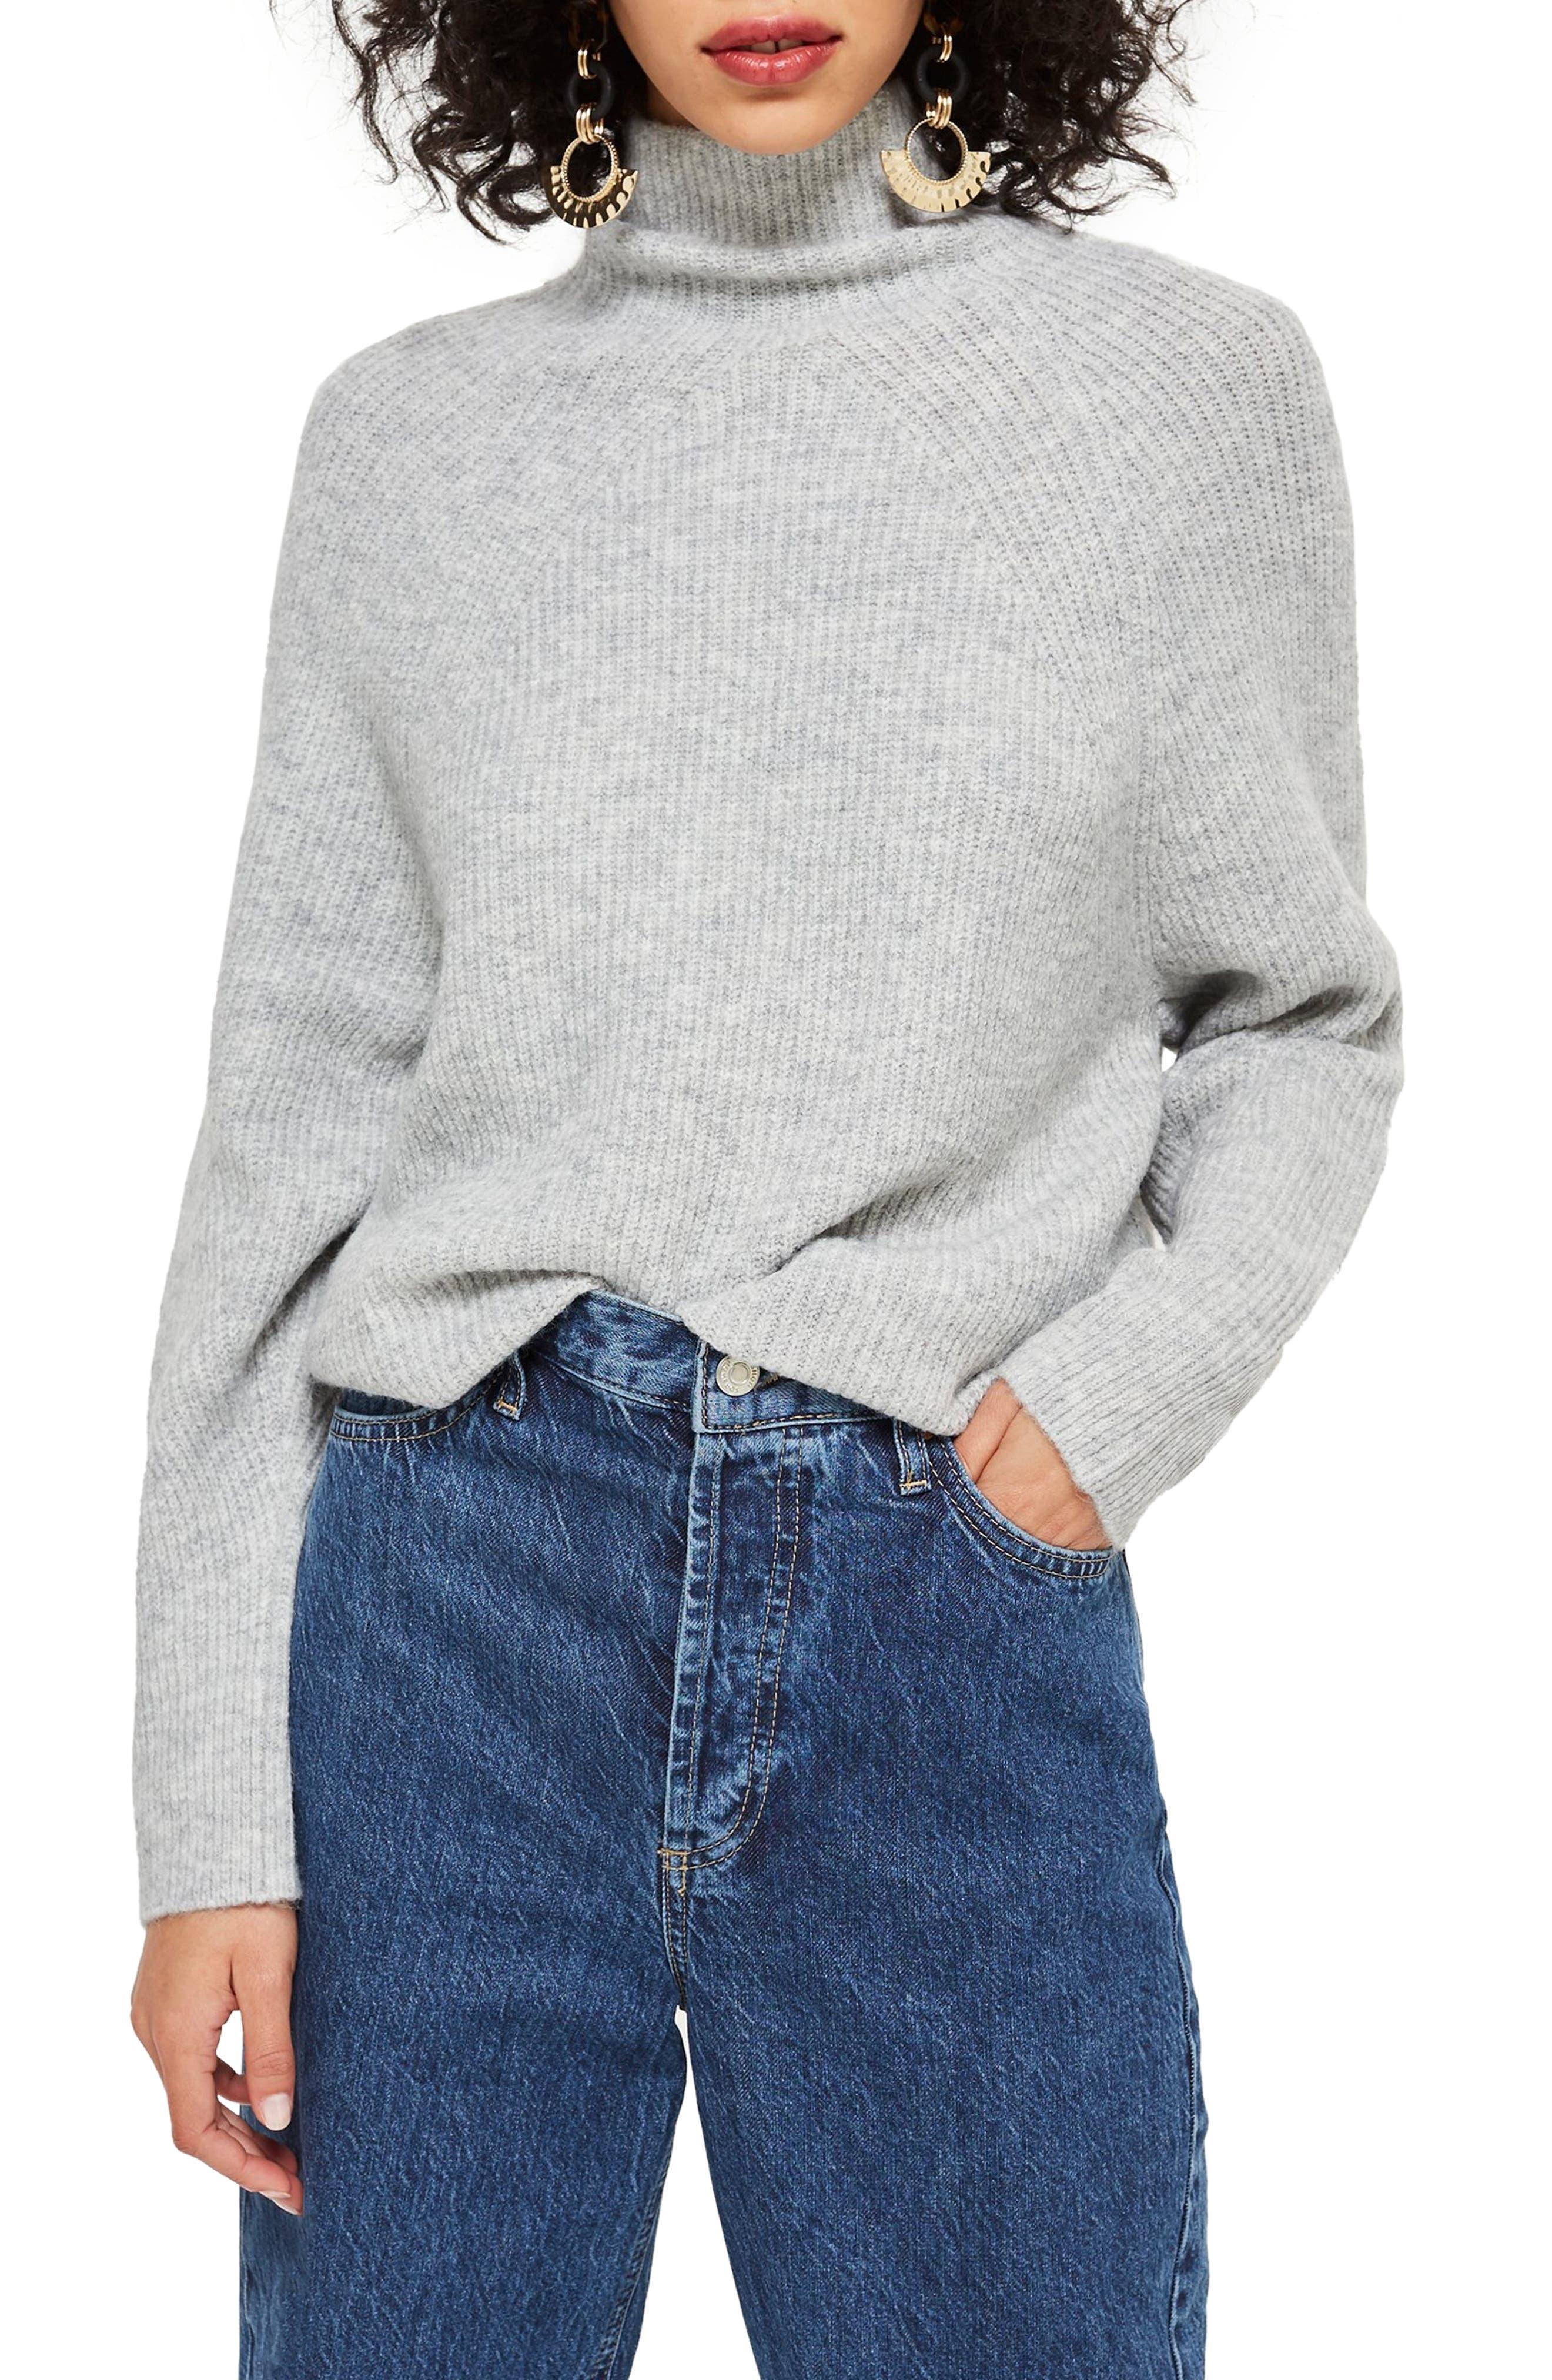 Raglan Turtleneck Neck Sweater,                             Main thumbnail 1, color,                             GREY MARL